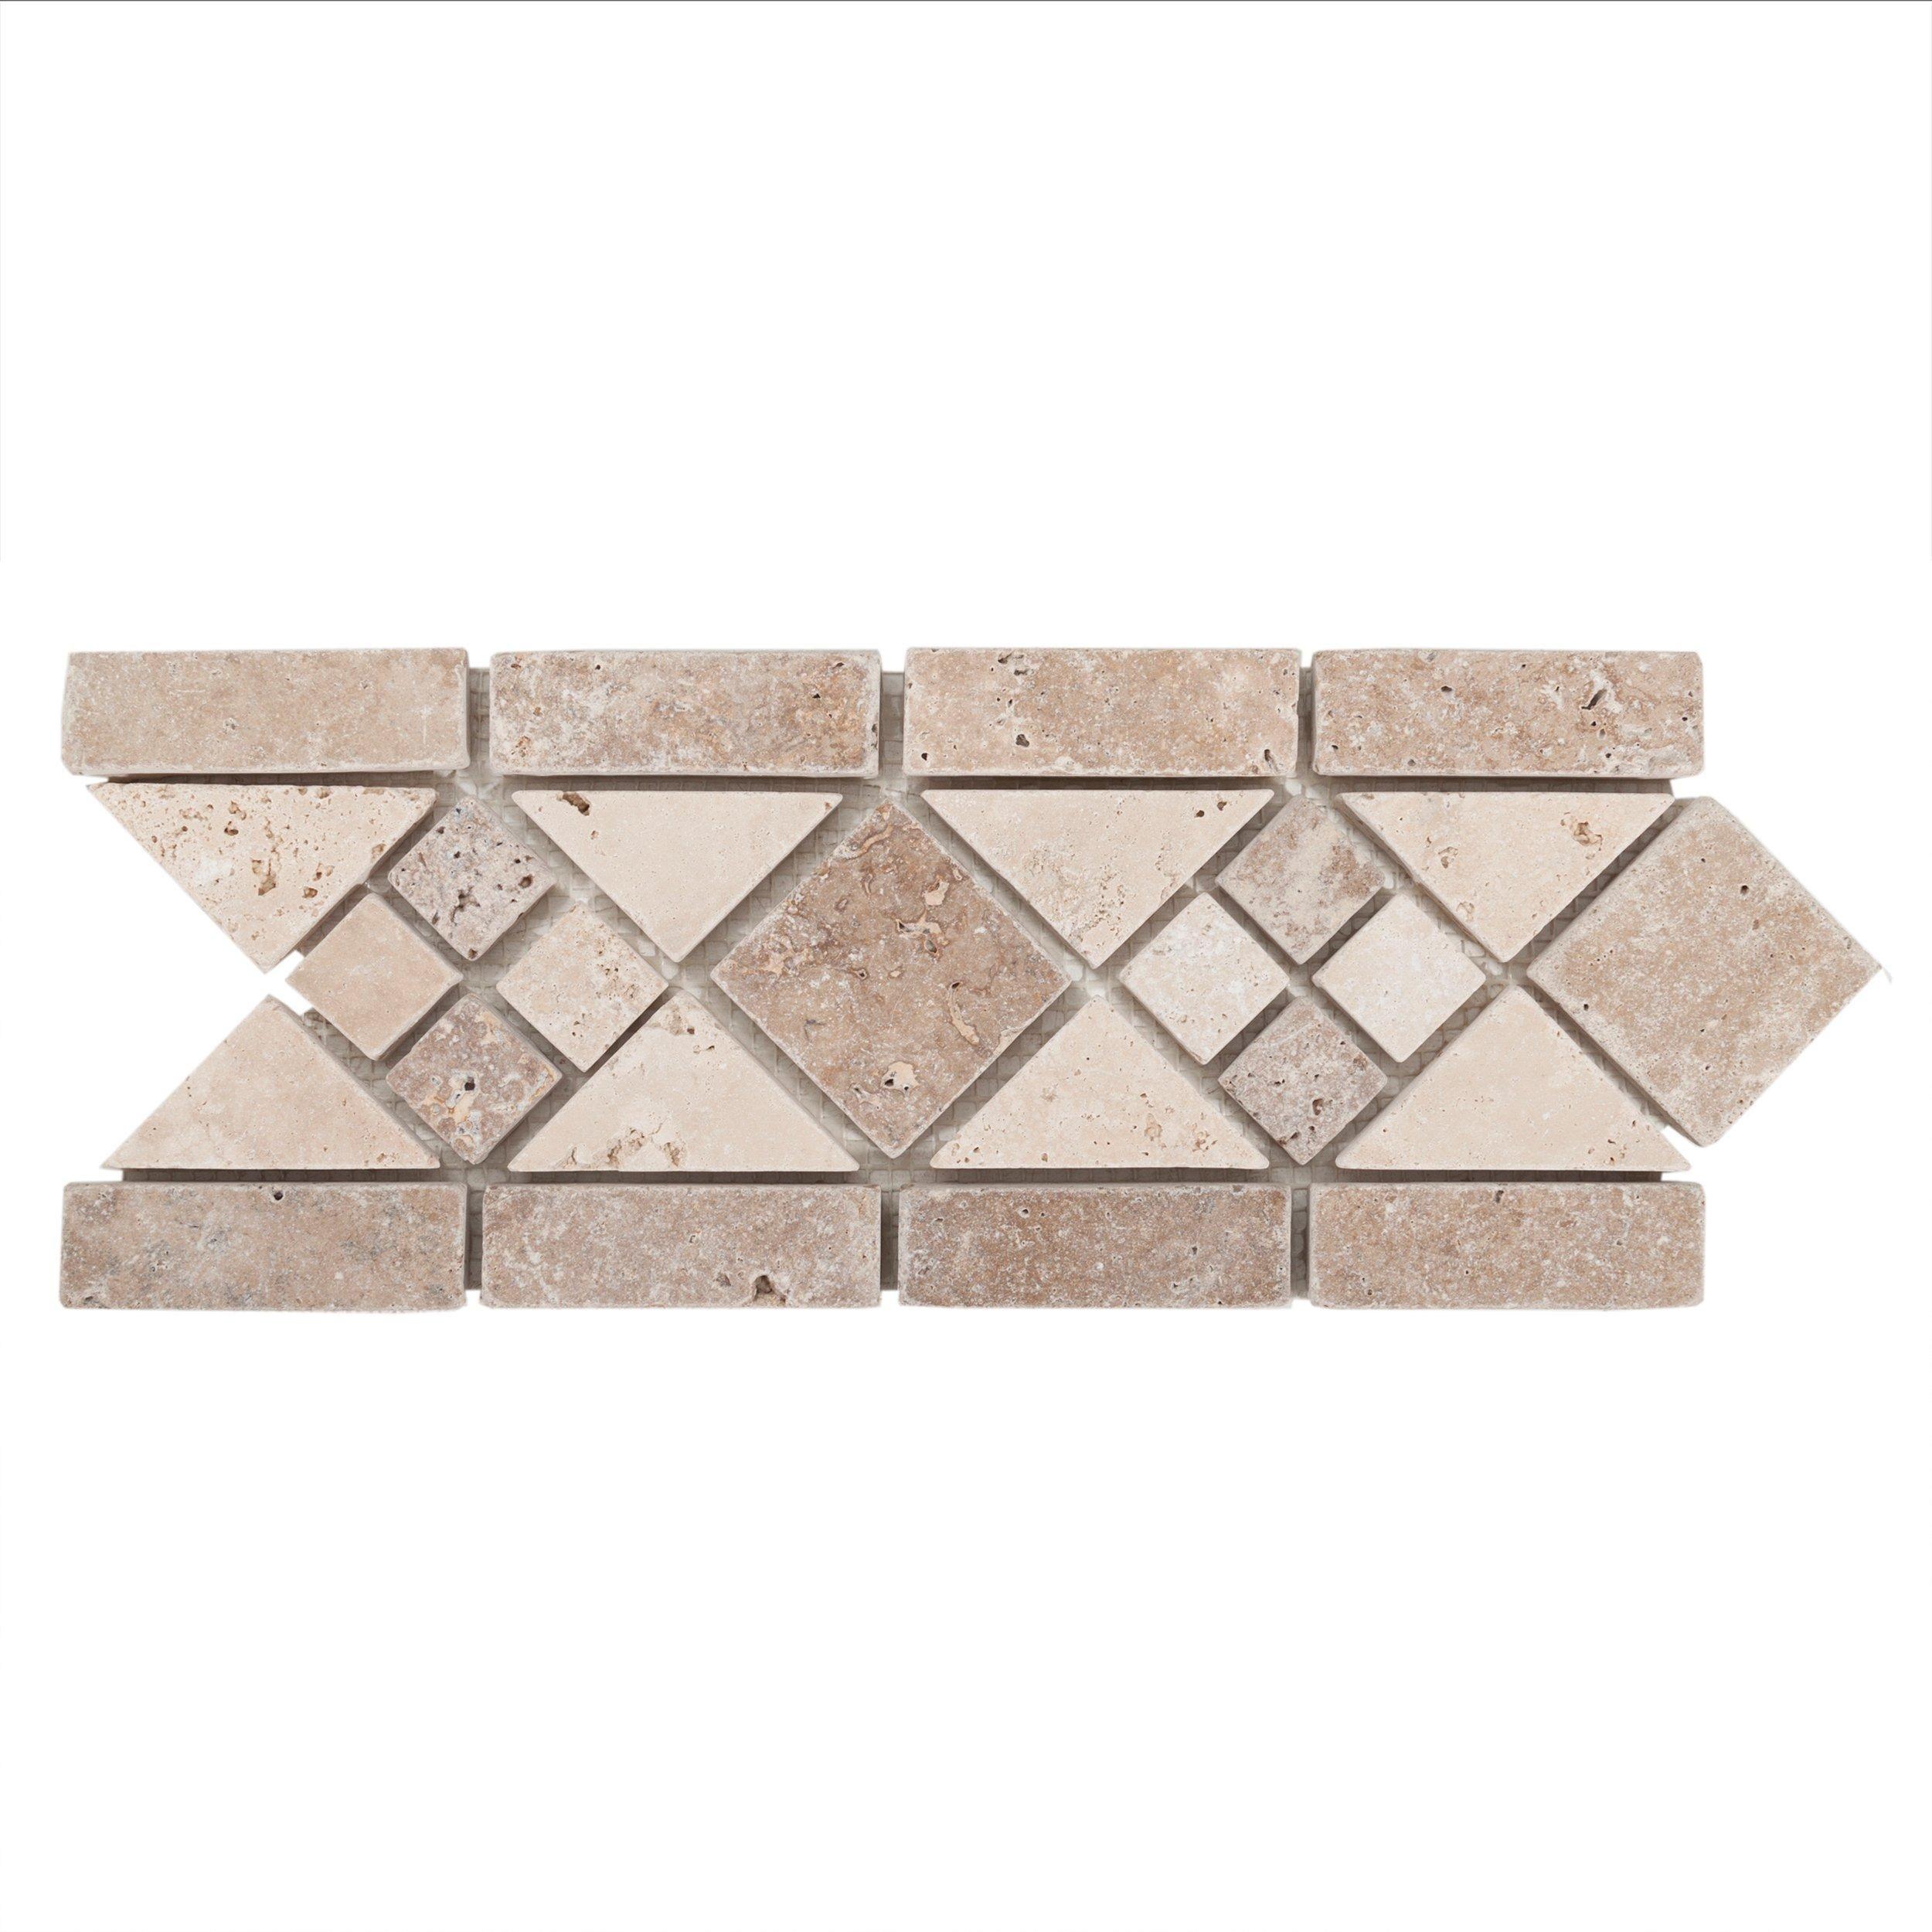 Norna Decorative Travertine Border Floor Decor In 2020 Floor Decor Travertine Mosaic Tile Backsplash Bathroom